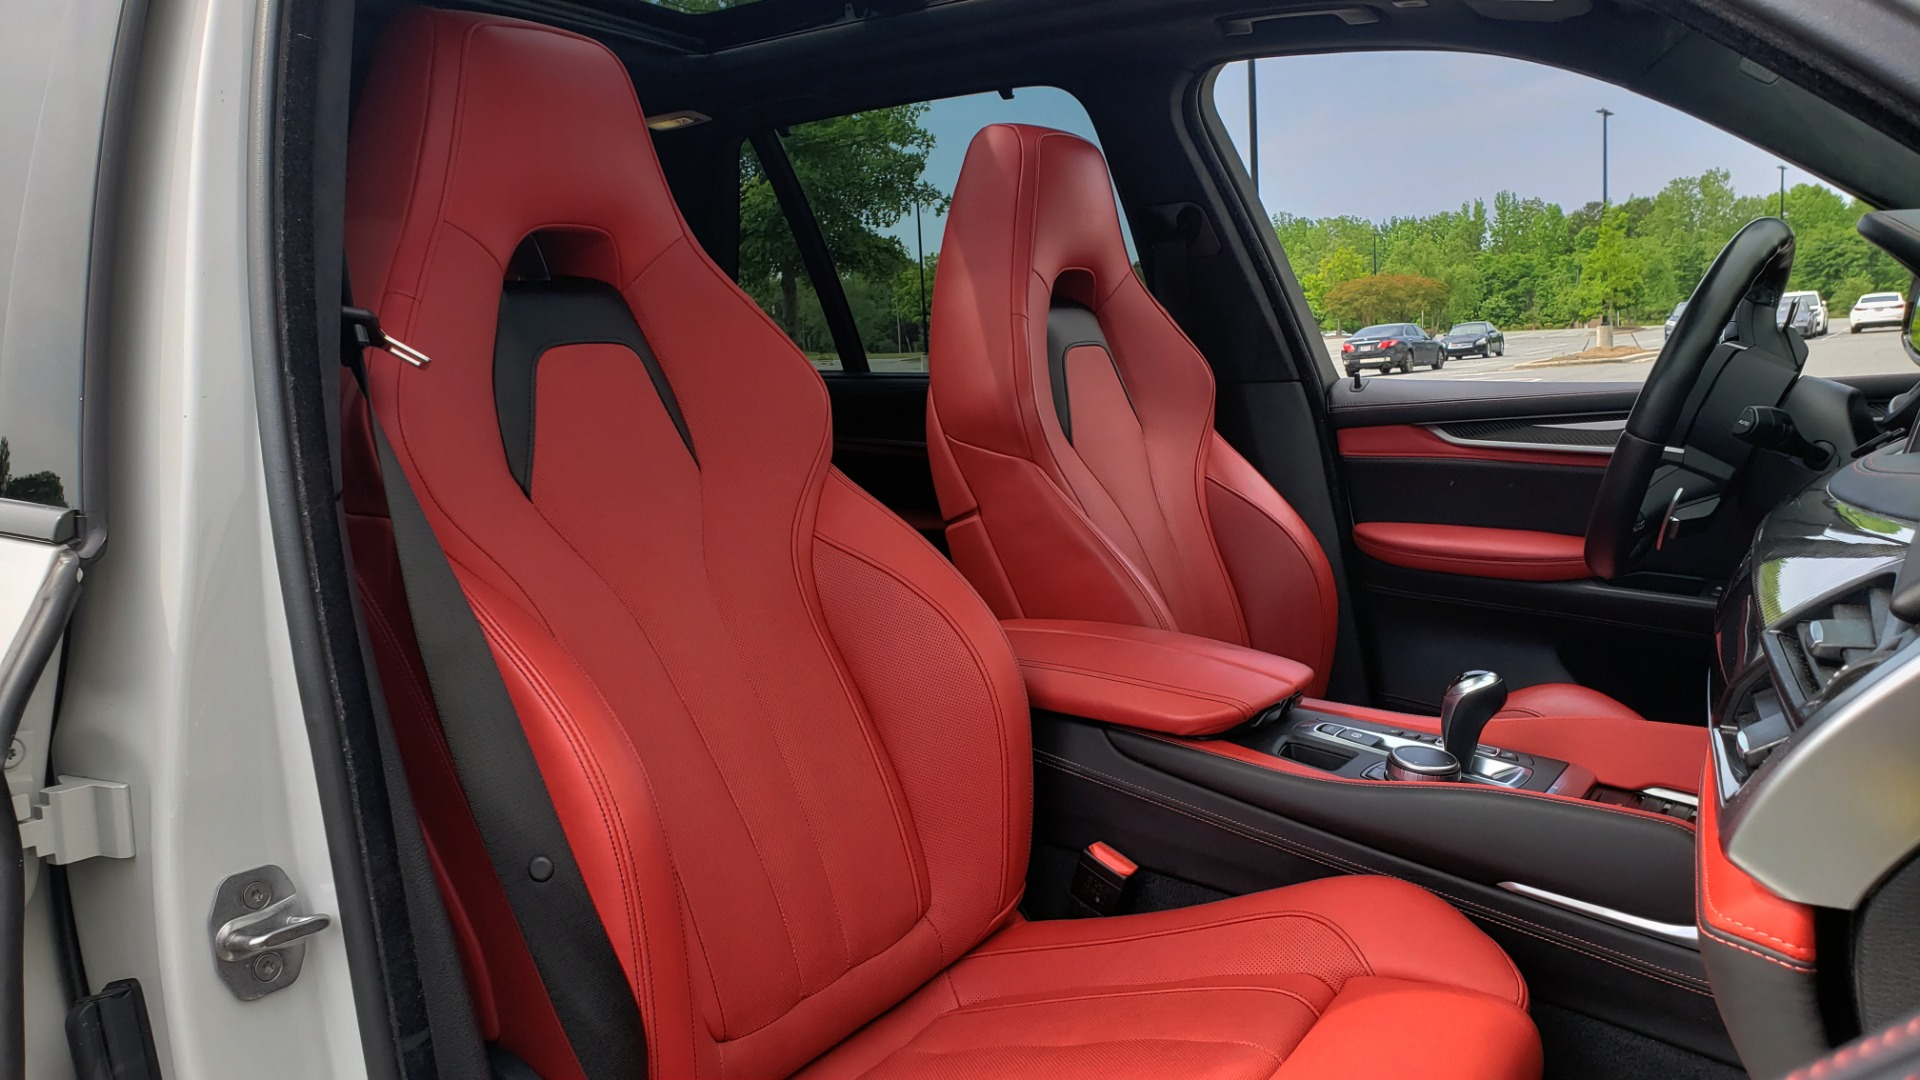 Used 2017 BMW X5 M EXECUTIVE PKG / NAV / DRVR ASST / BSM / HUD / HTD STS / WIFI for sale Sold at Formula Imports in Charlotte NC 28227 72